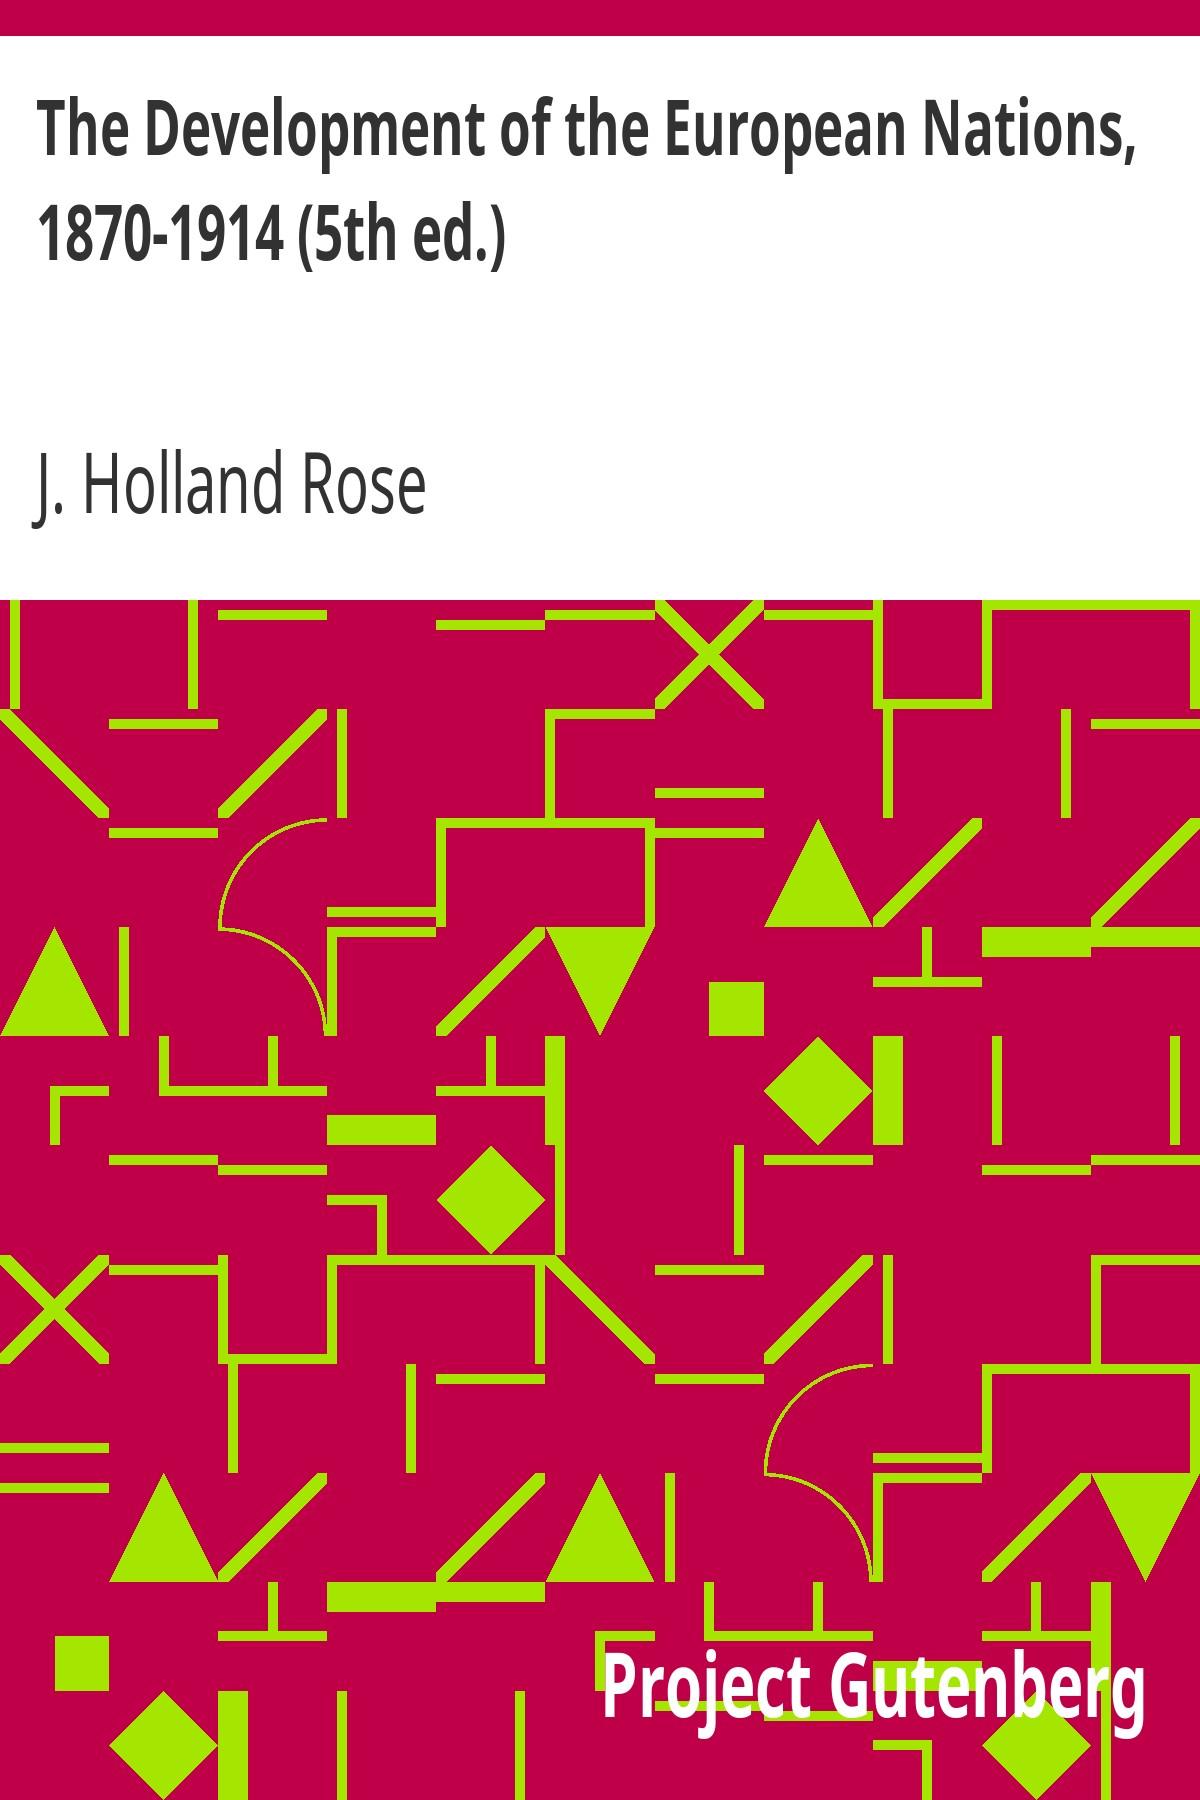 John Holland Rose The Development of the European Nations, 1870-1914 (5th ed.)